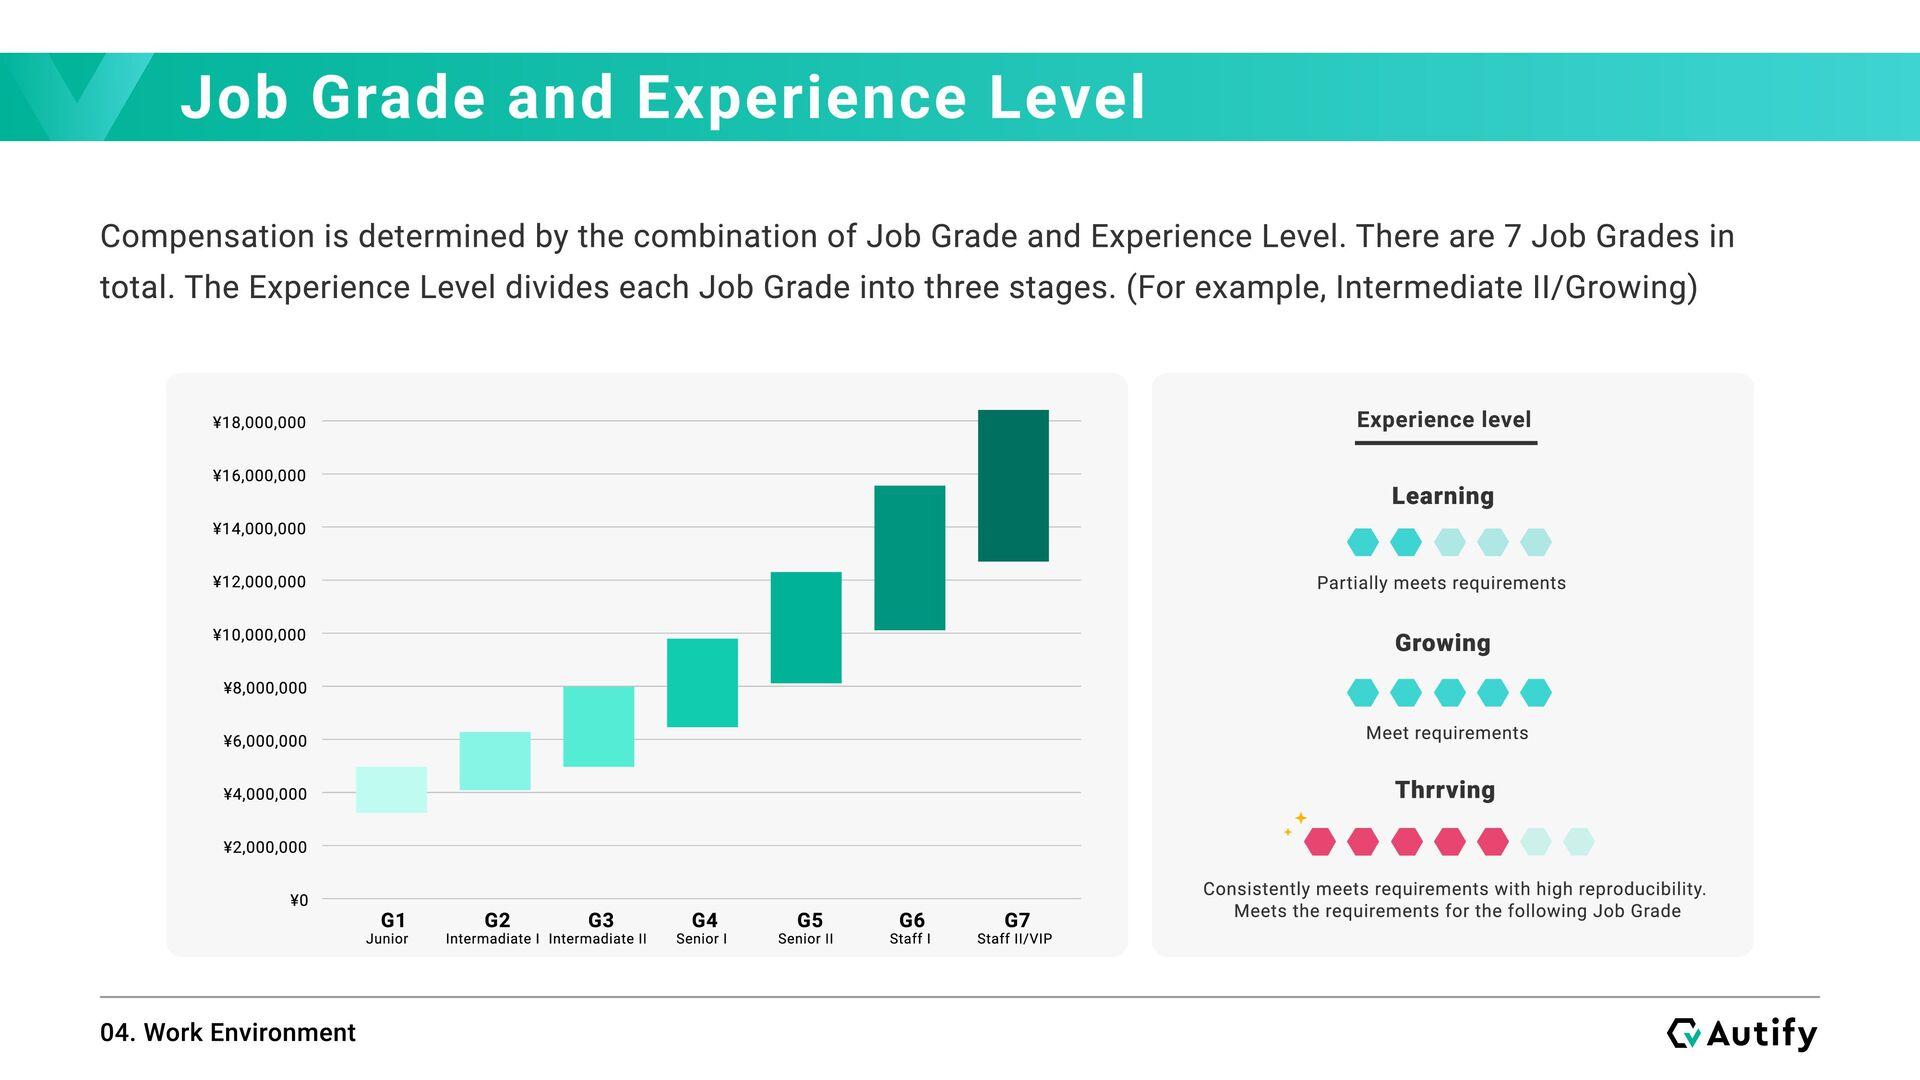 05. Autify's Technology